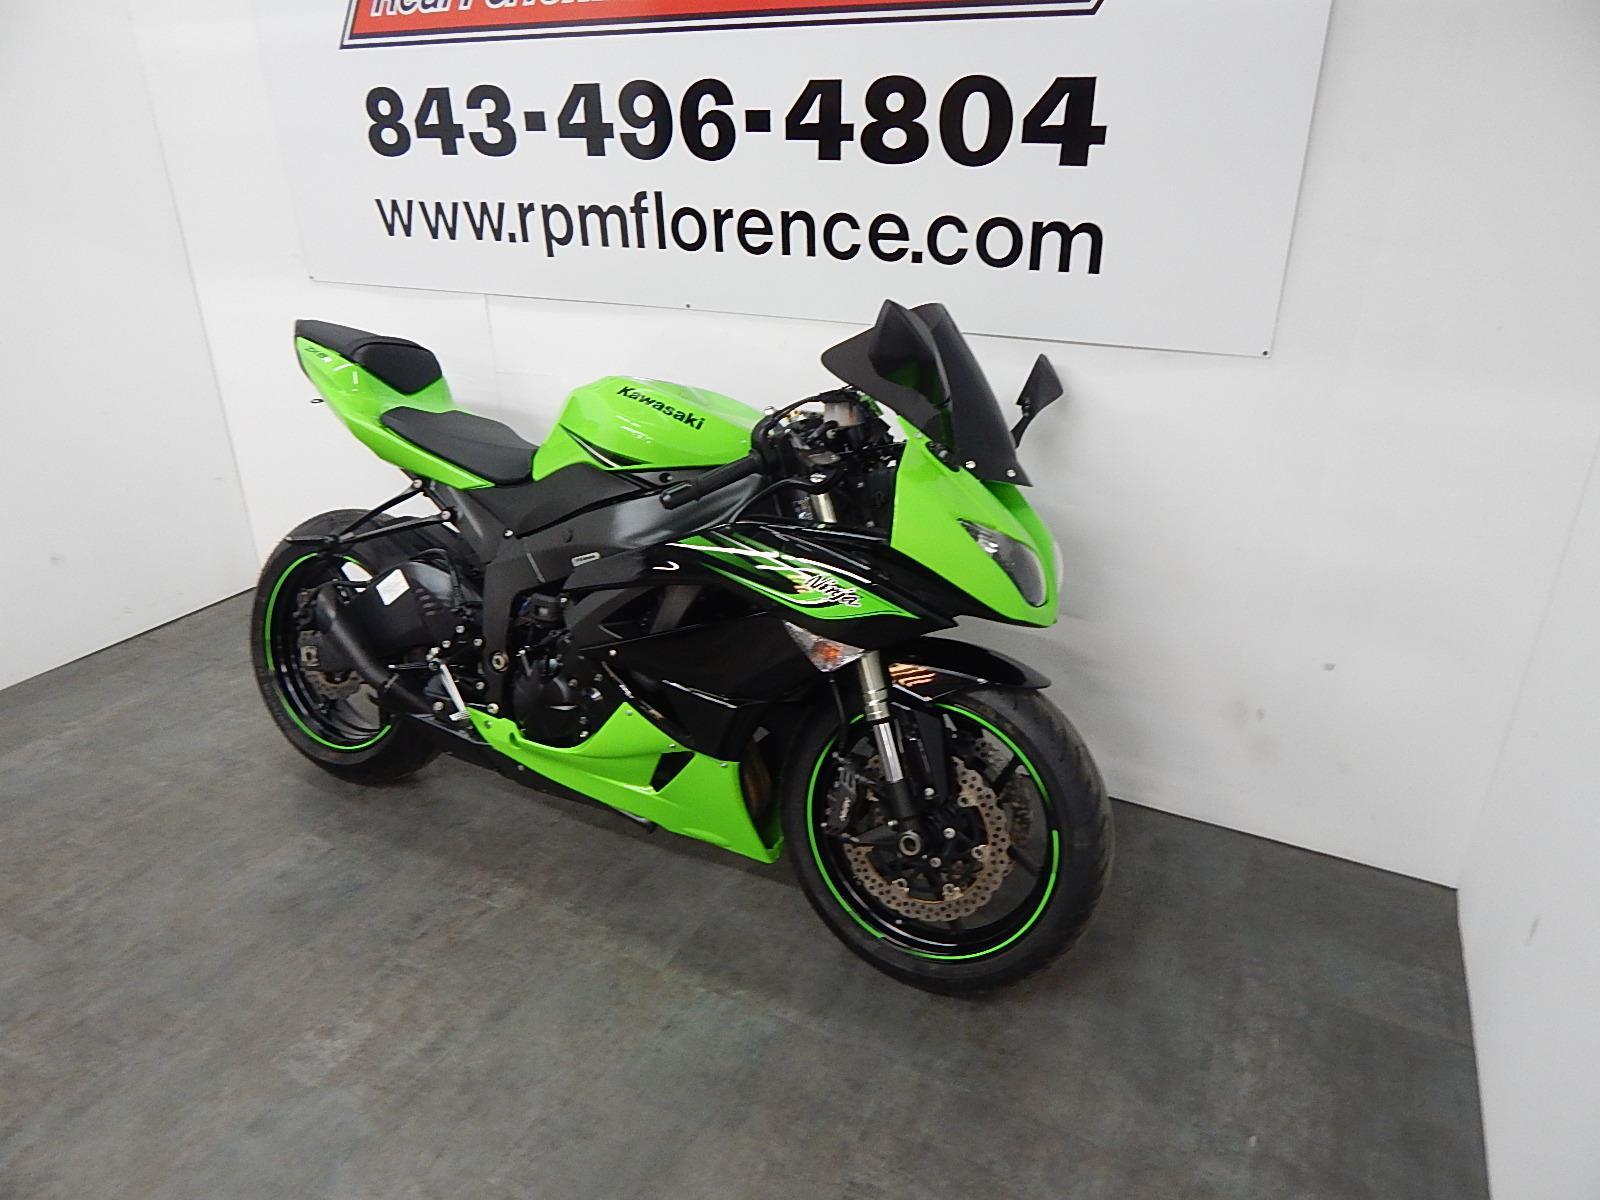 2011 Kawasaki Ninja Zx 6r For Sale In Florence Sc Real